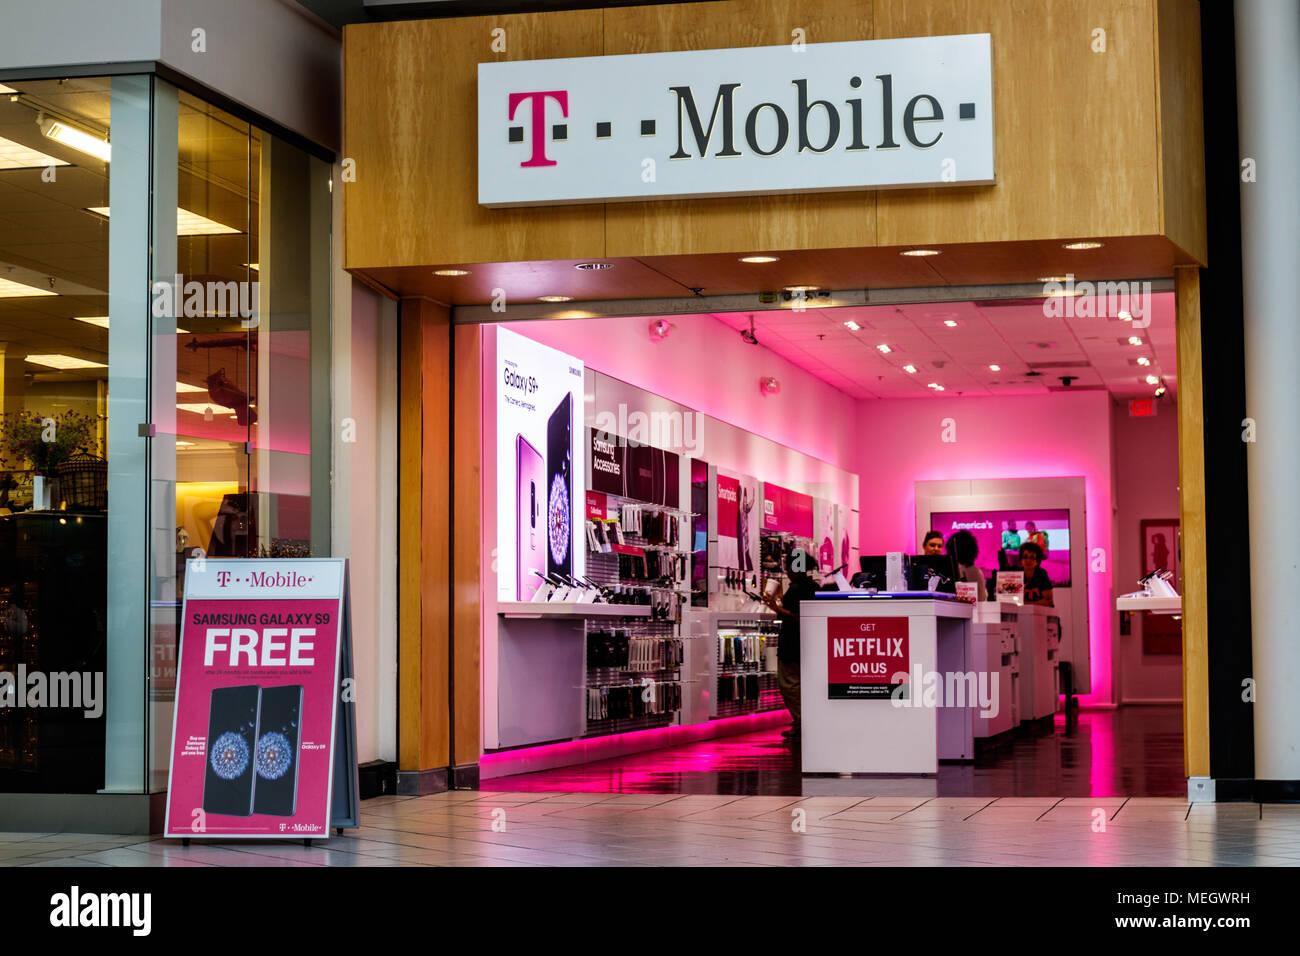 Dayton Ca April 2018 T Mobile Retail Wireless Store Die